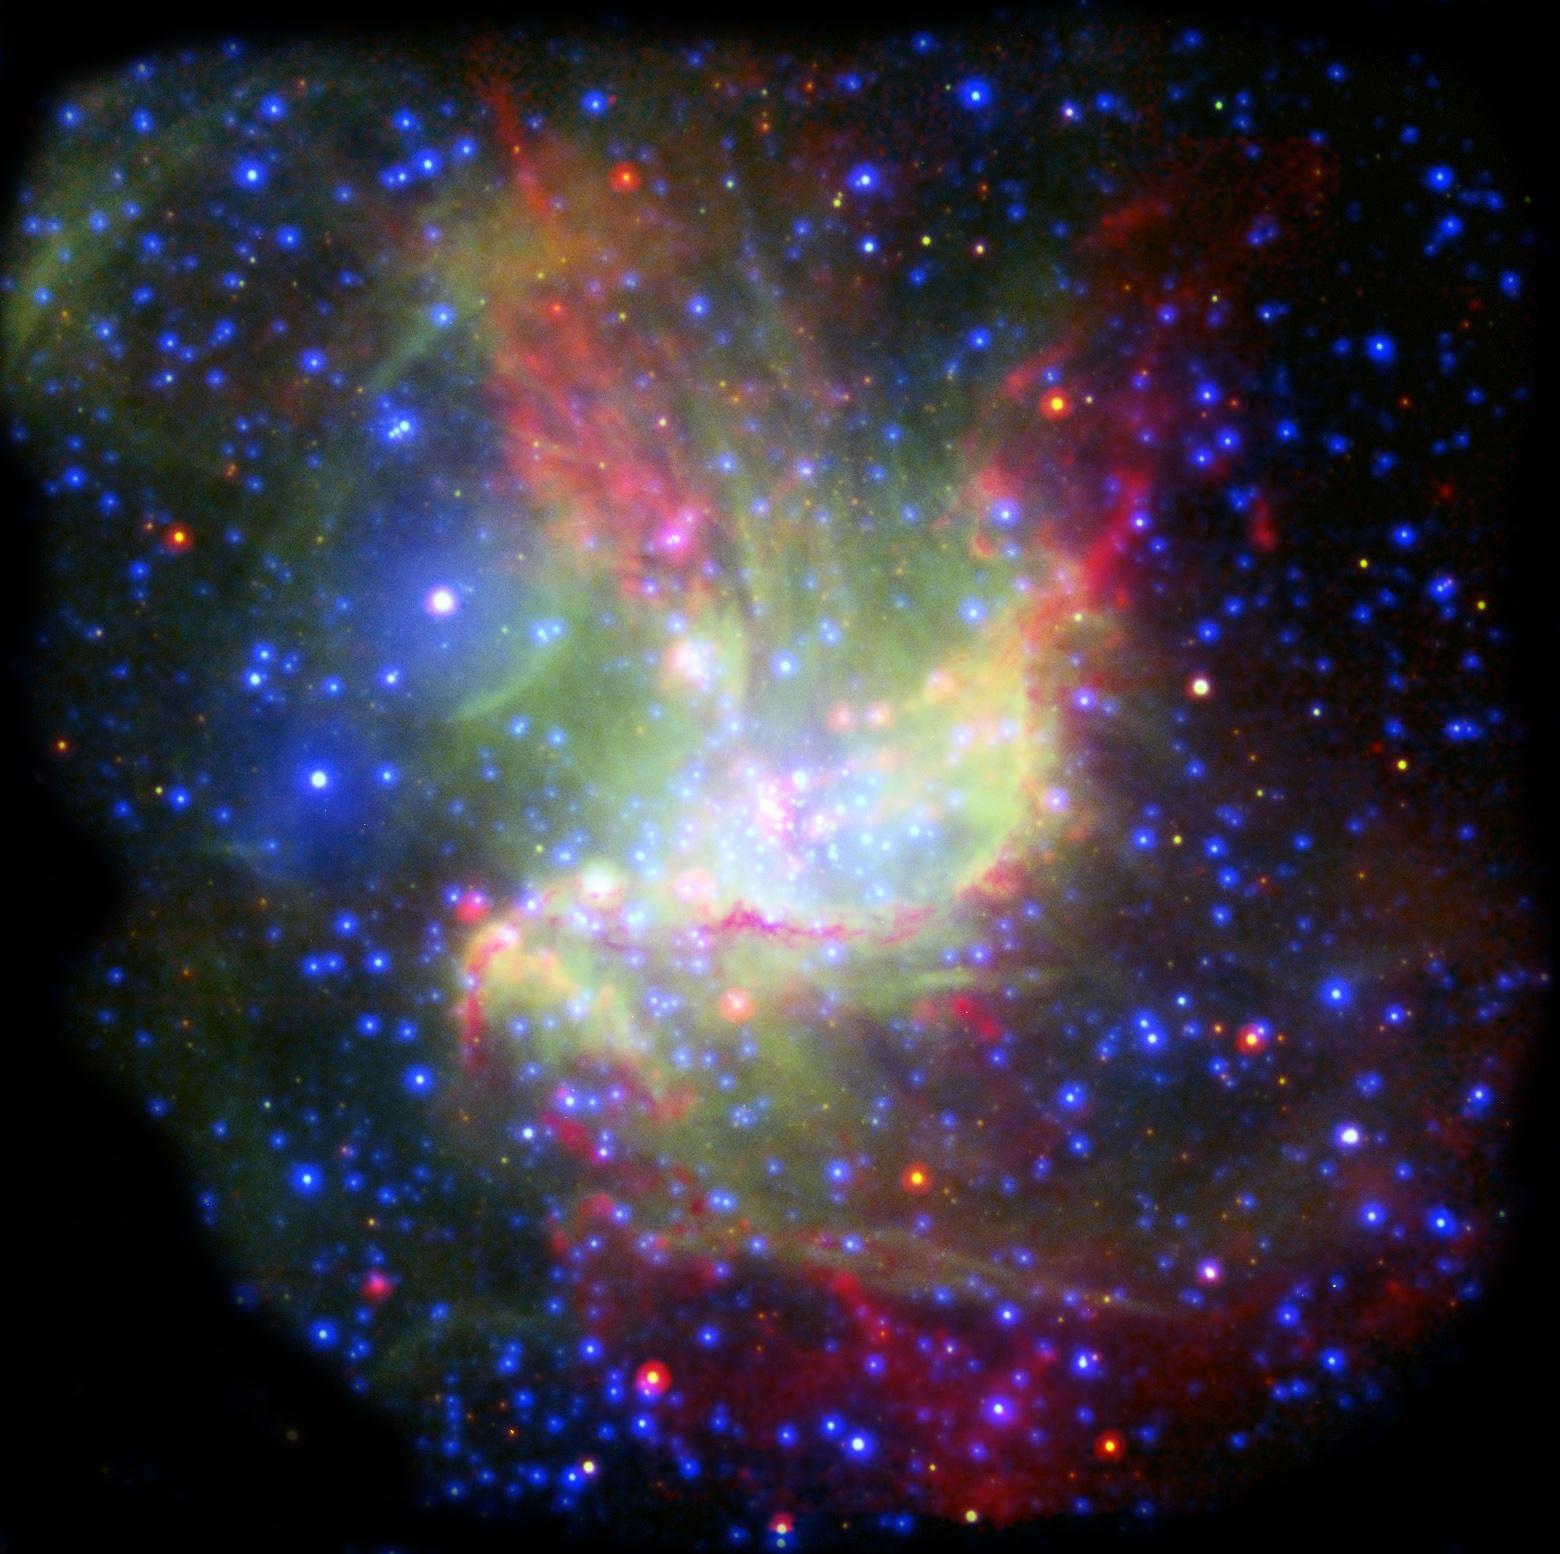 1560x1554 Irregular Galaxy Irregular Galaxies Images Very Good God